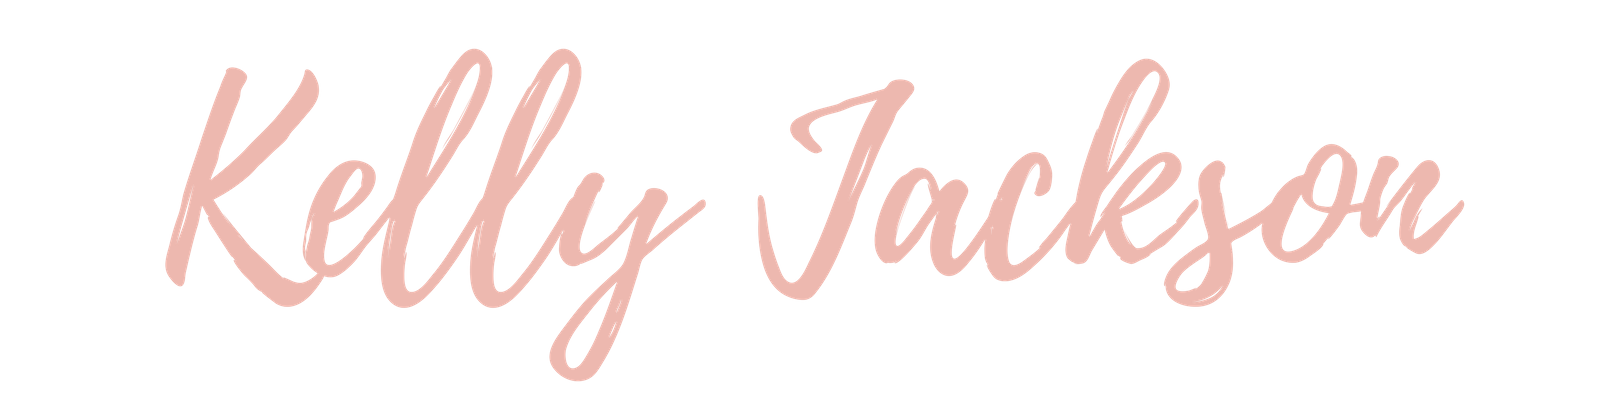 Kelly Jackson signature